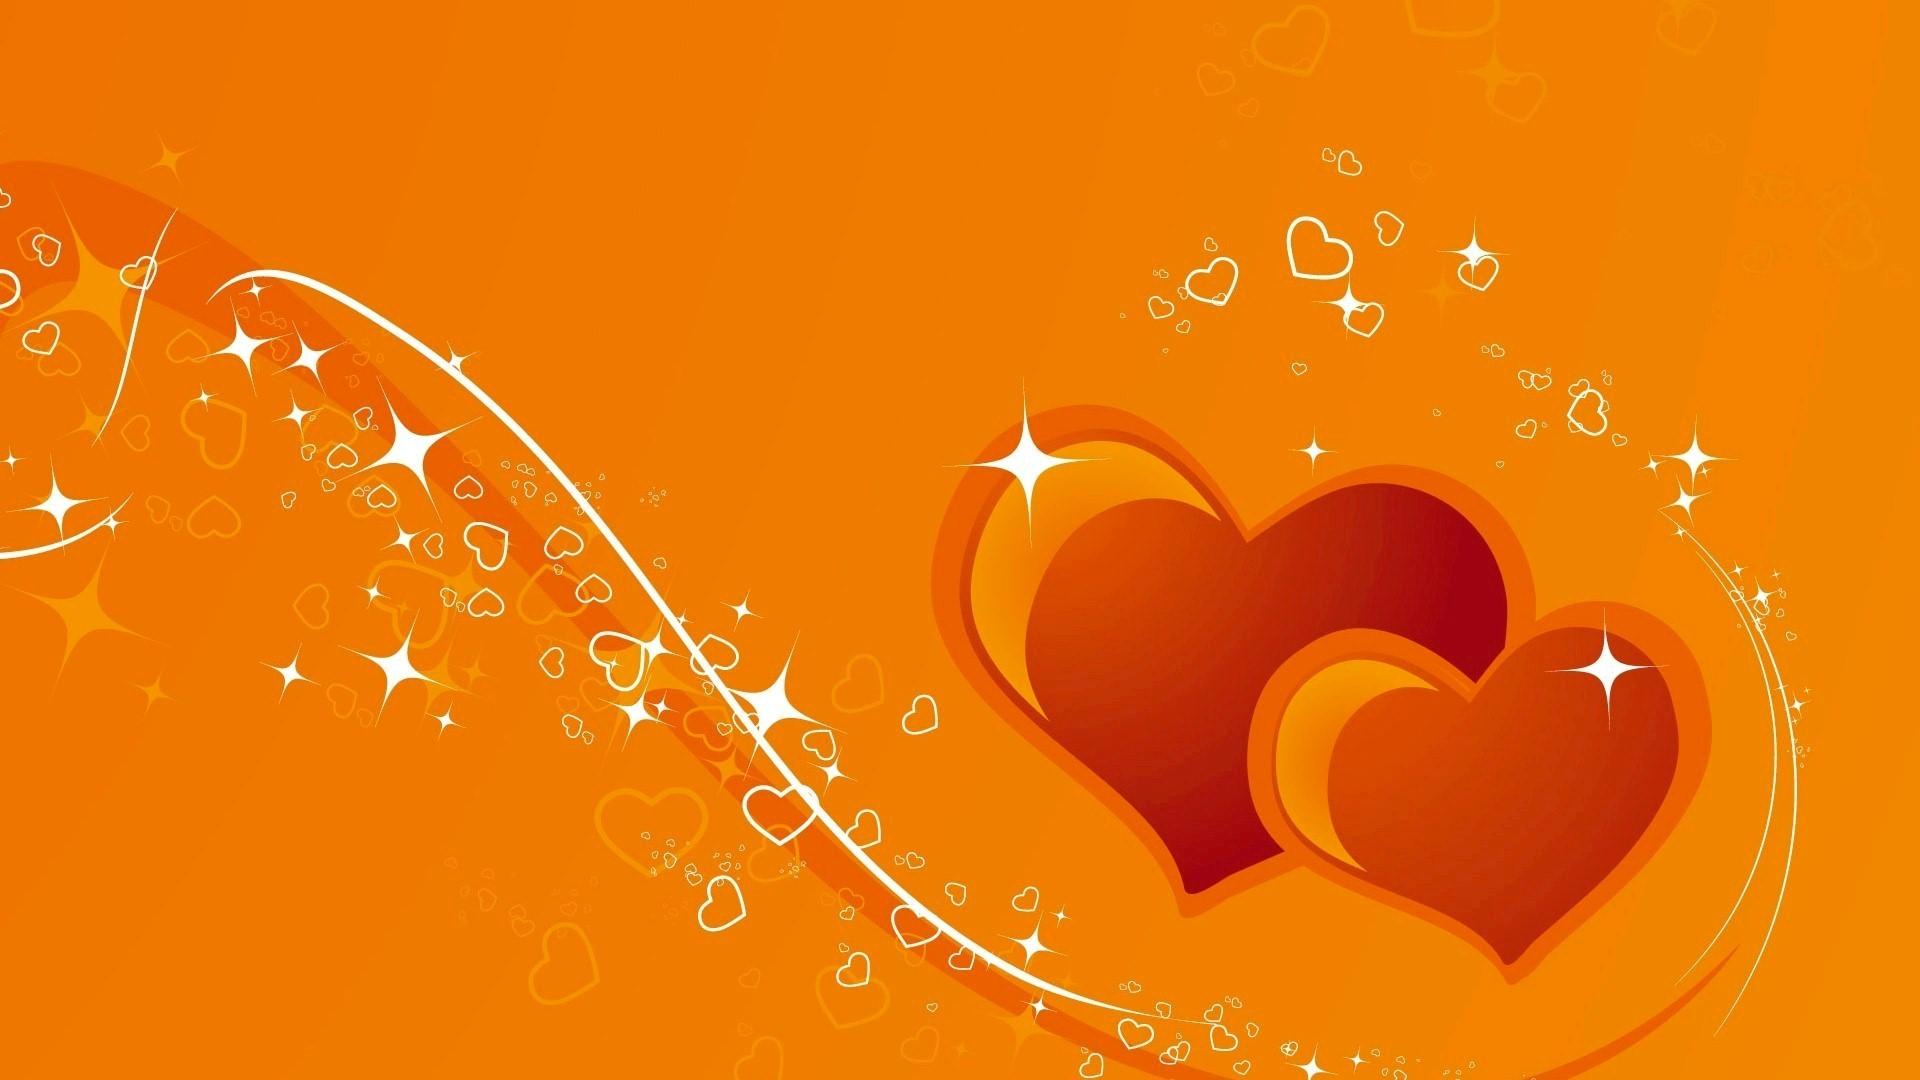 Beautiful heart wallpapers wallpapersafari - Best heart wallpaper hd ...